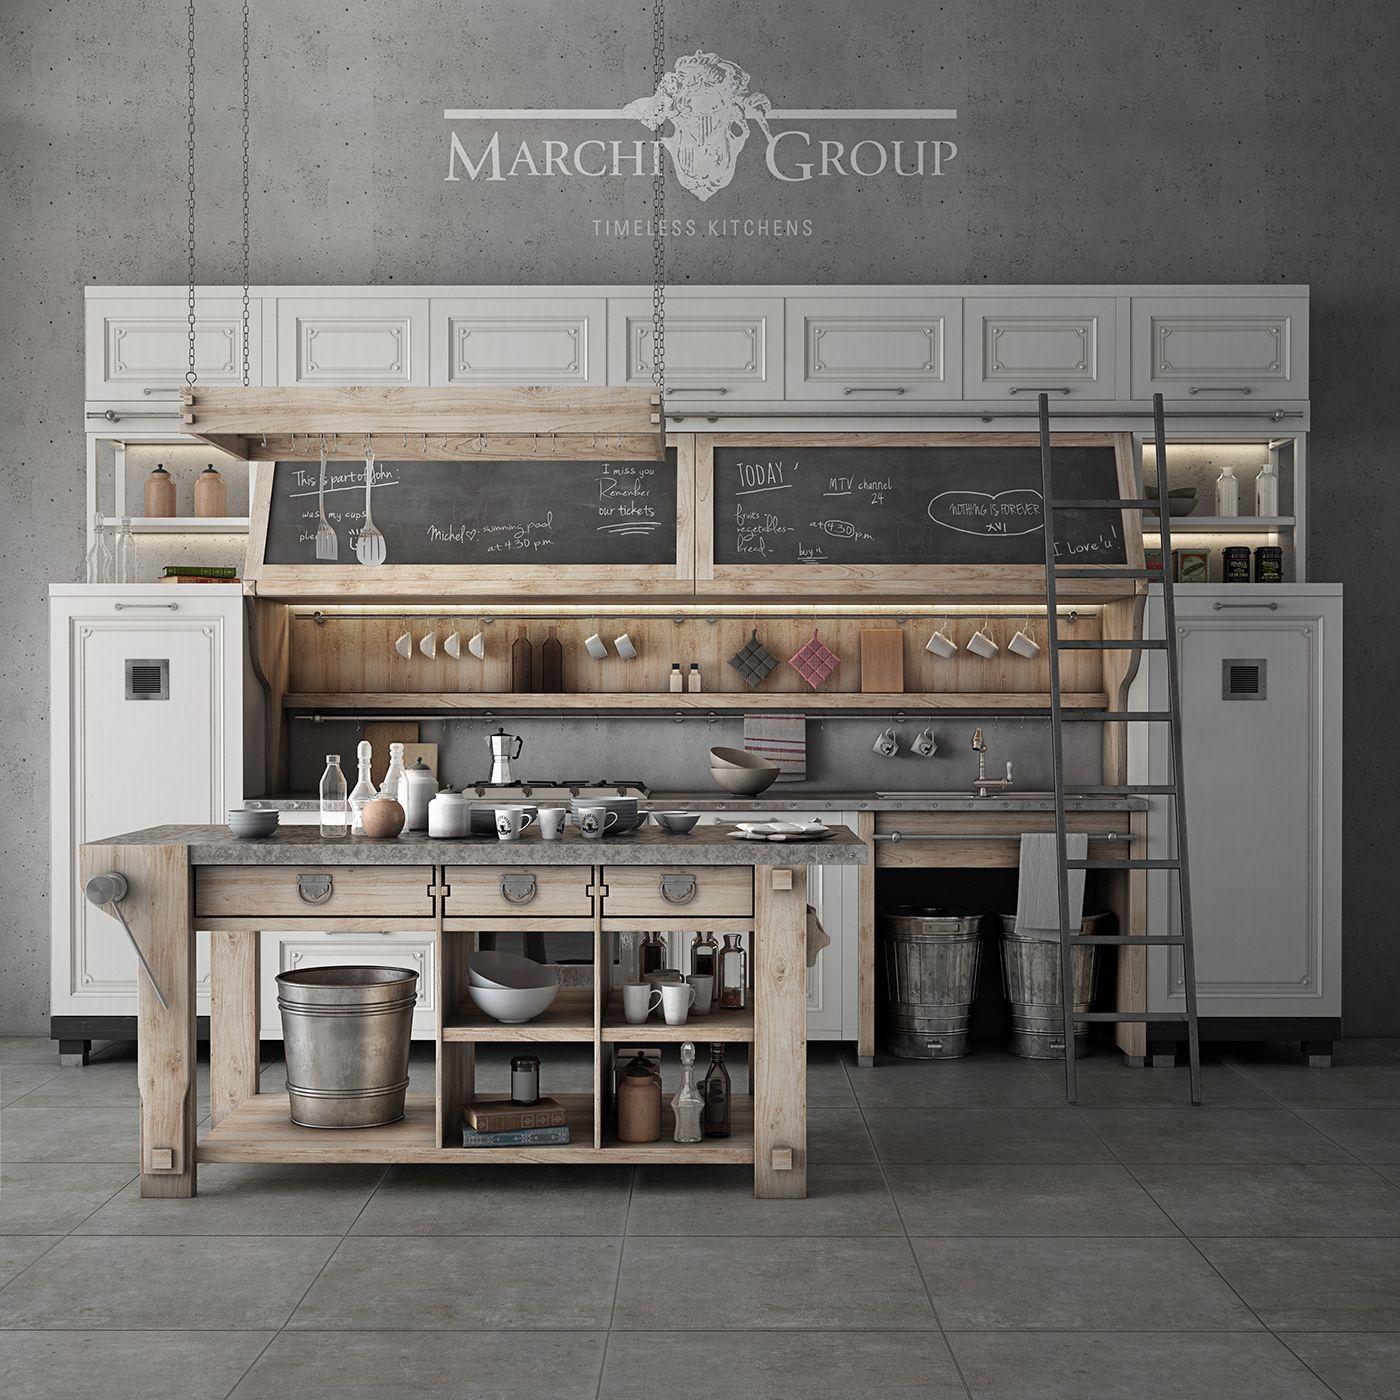 3d model kitchen 176 free download  kitchen timeless